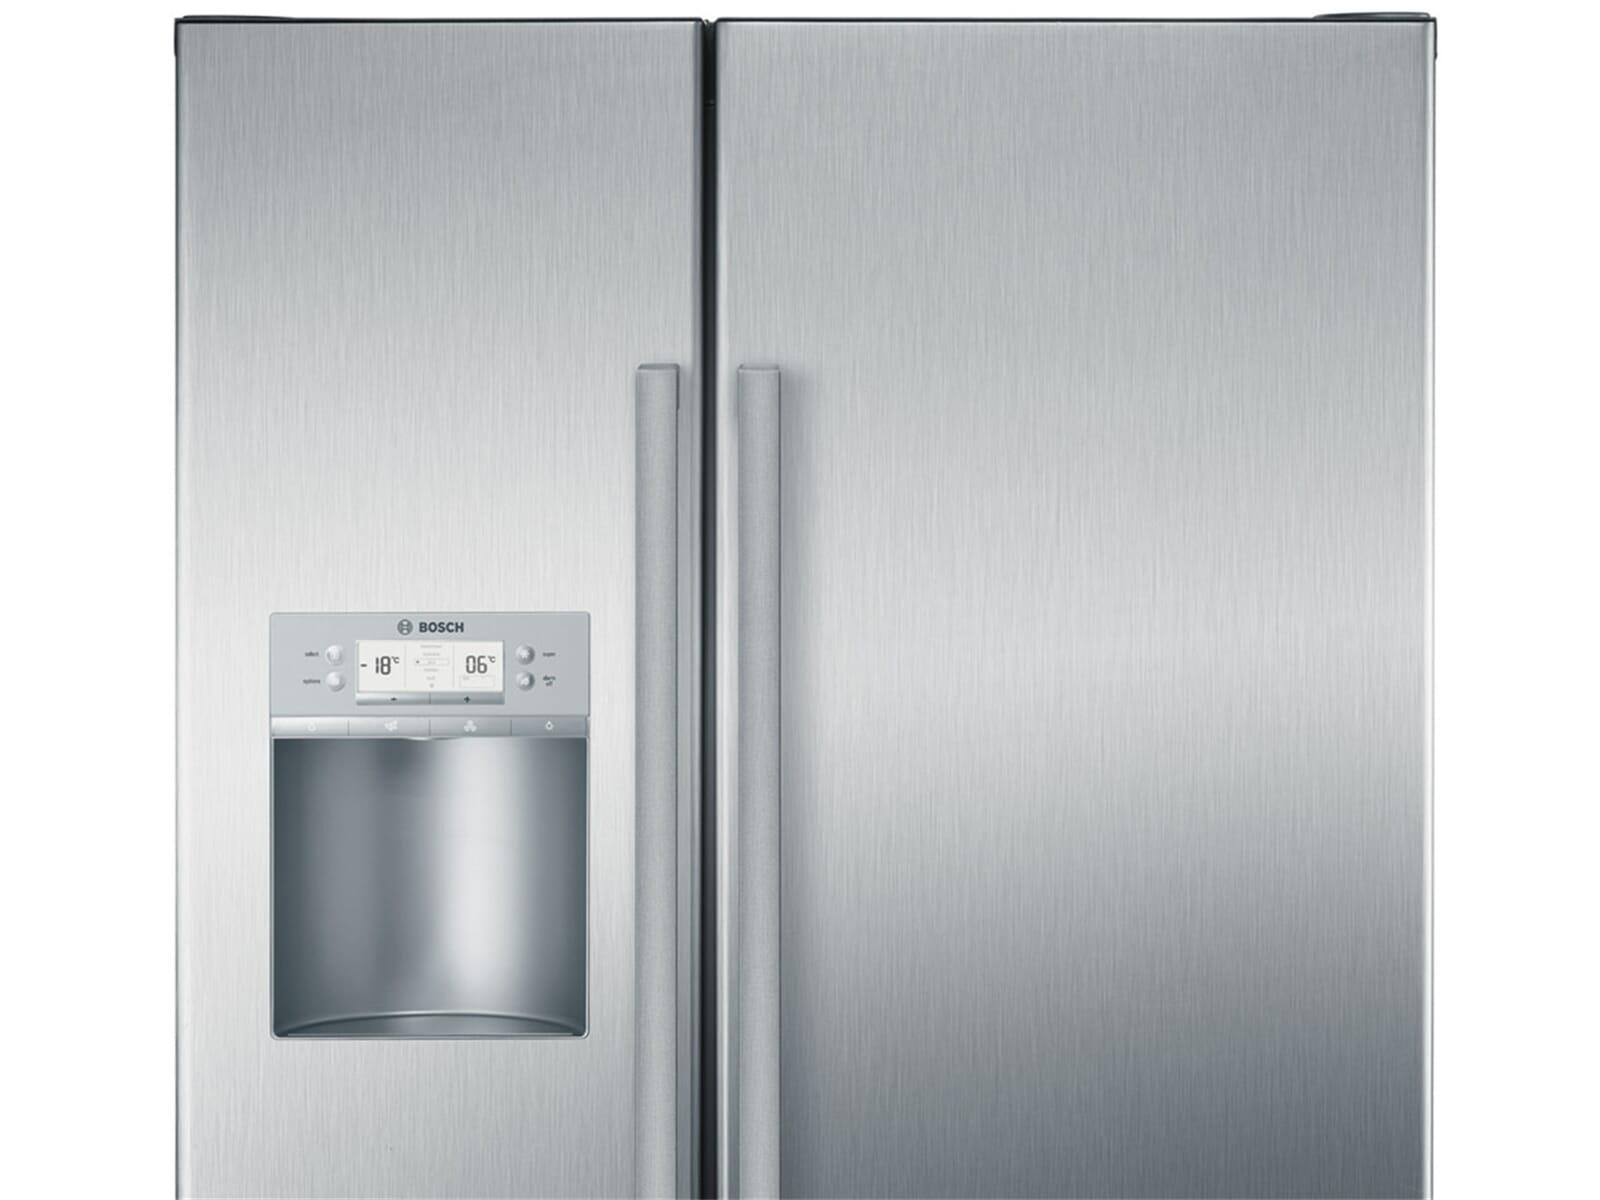 Bosch Kühlschrank Vitafresh Bedienungsanleitung : Bosch kühlschrank vitafresh bedienungsanleitung